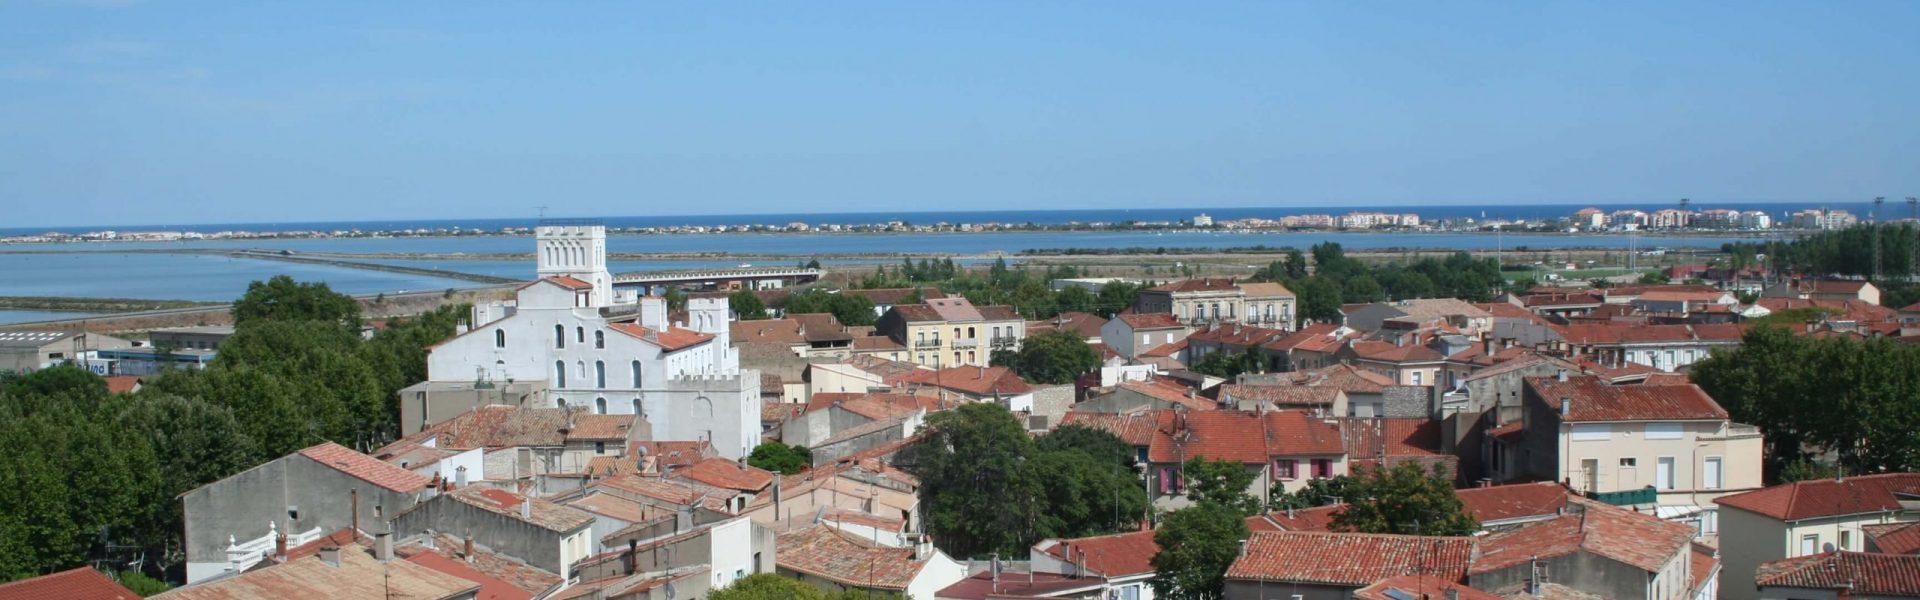 Vue panoramique de la ville de Frontignan